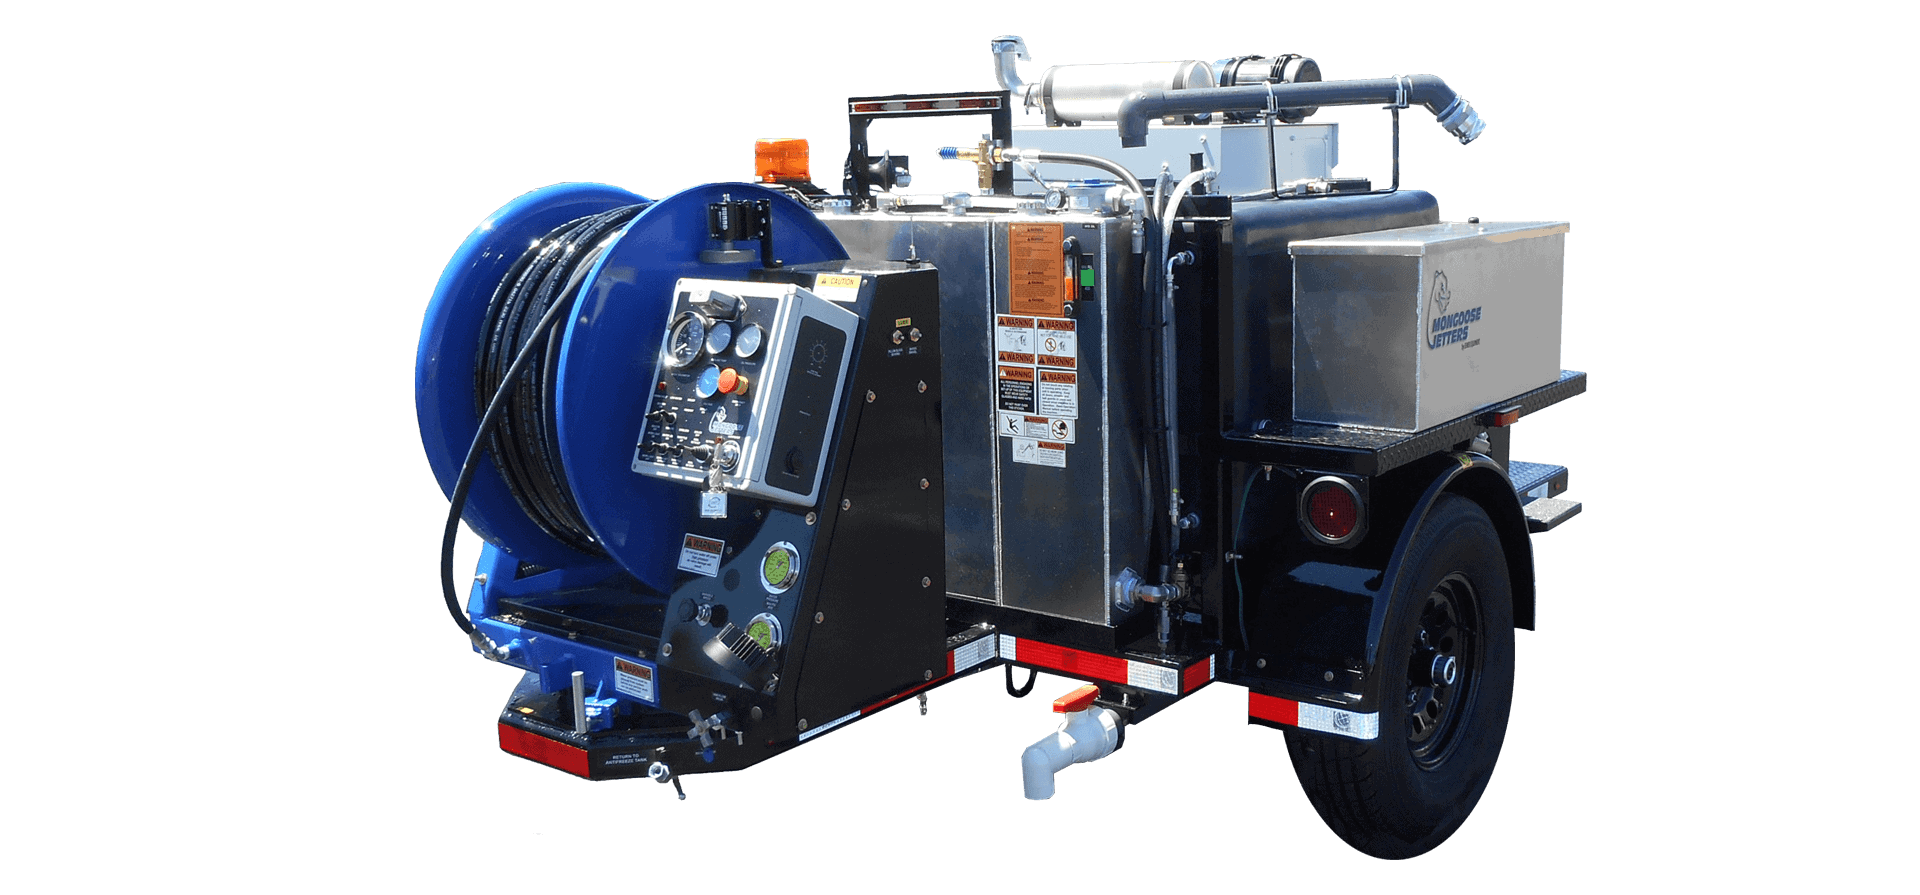 Mongoose Jetters, sewer jet Trailer, Model 254, sewer jet